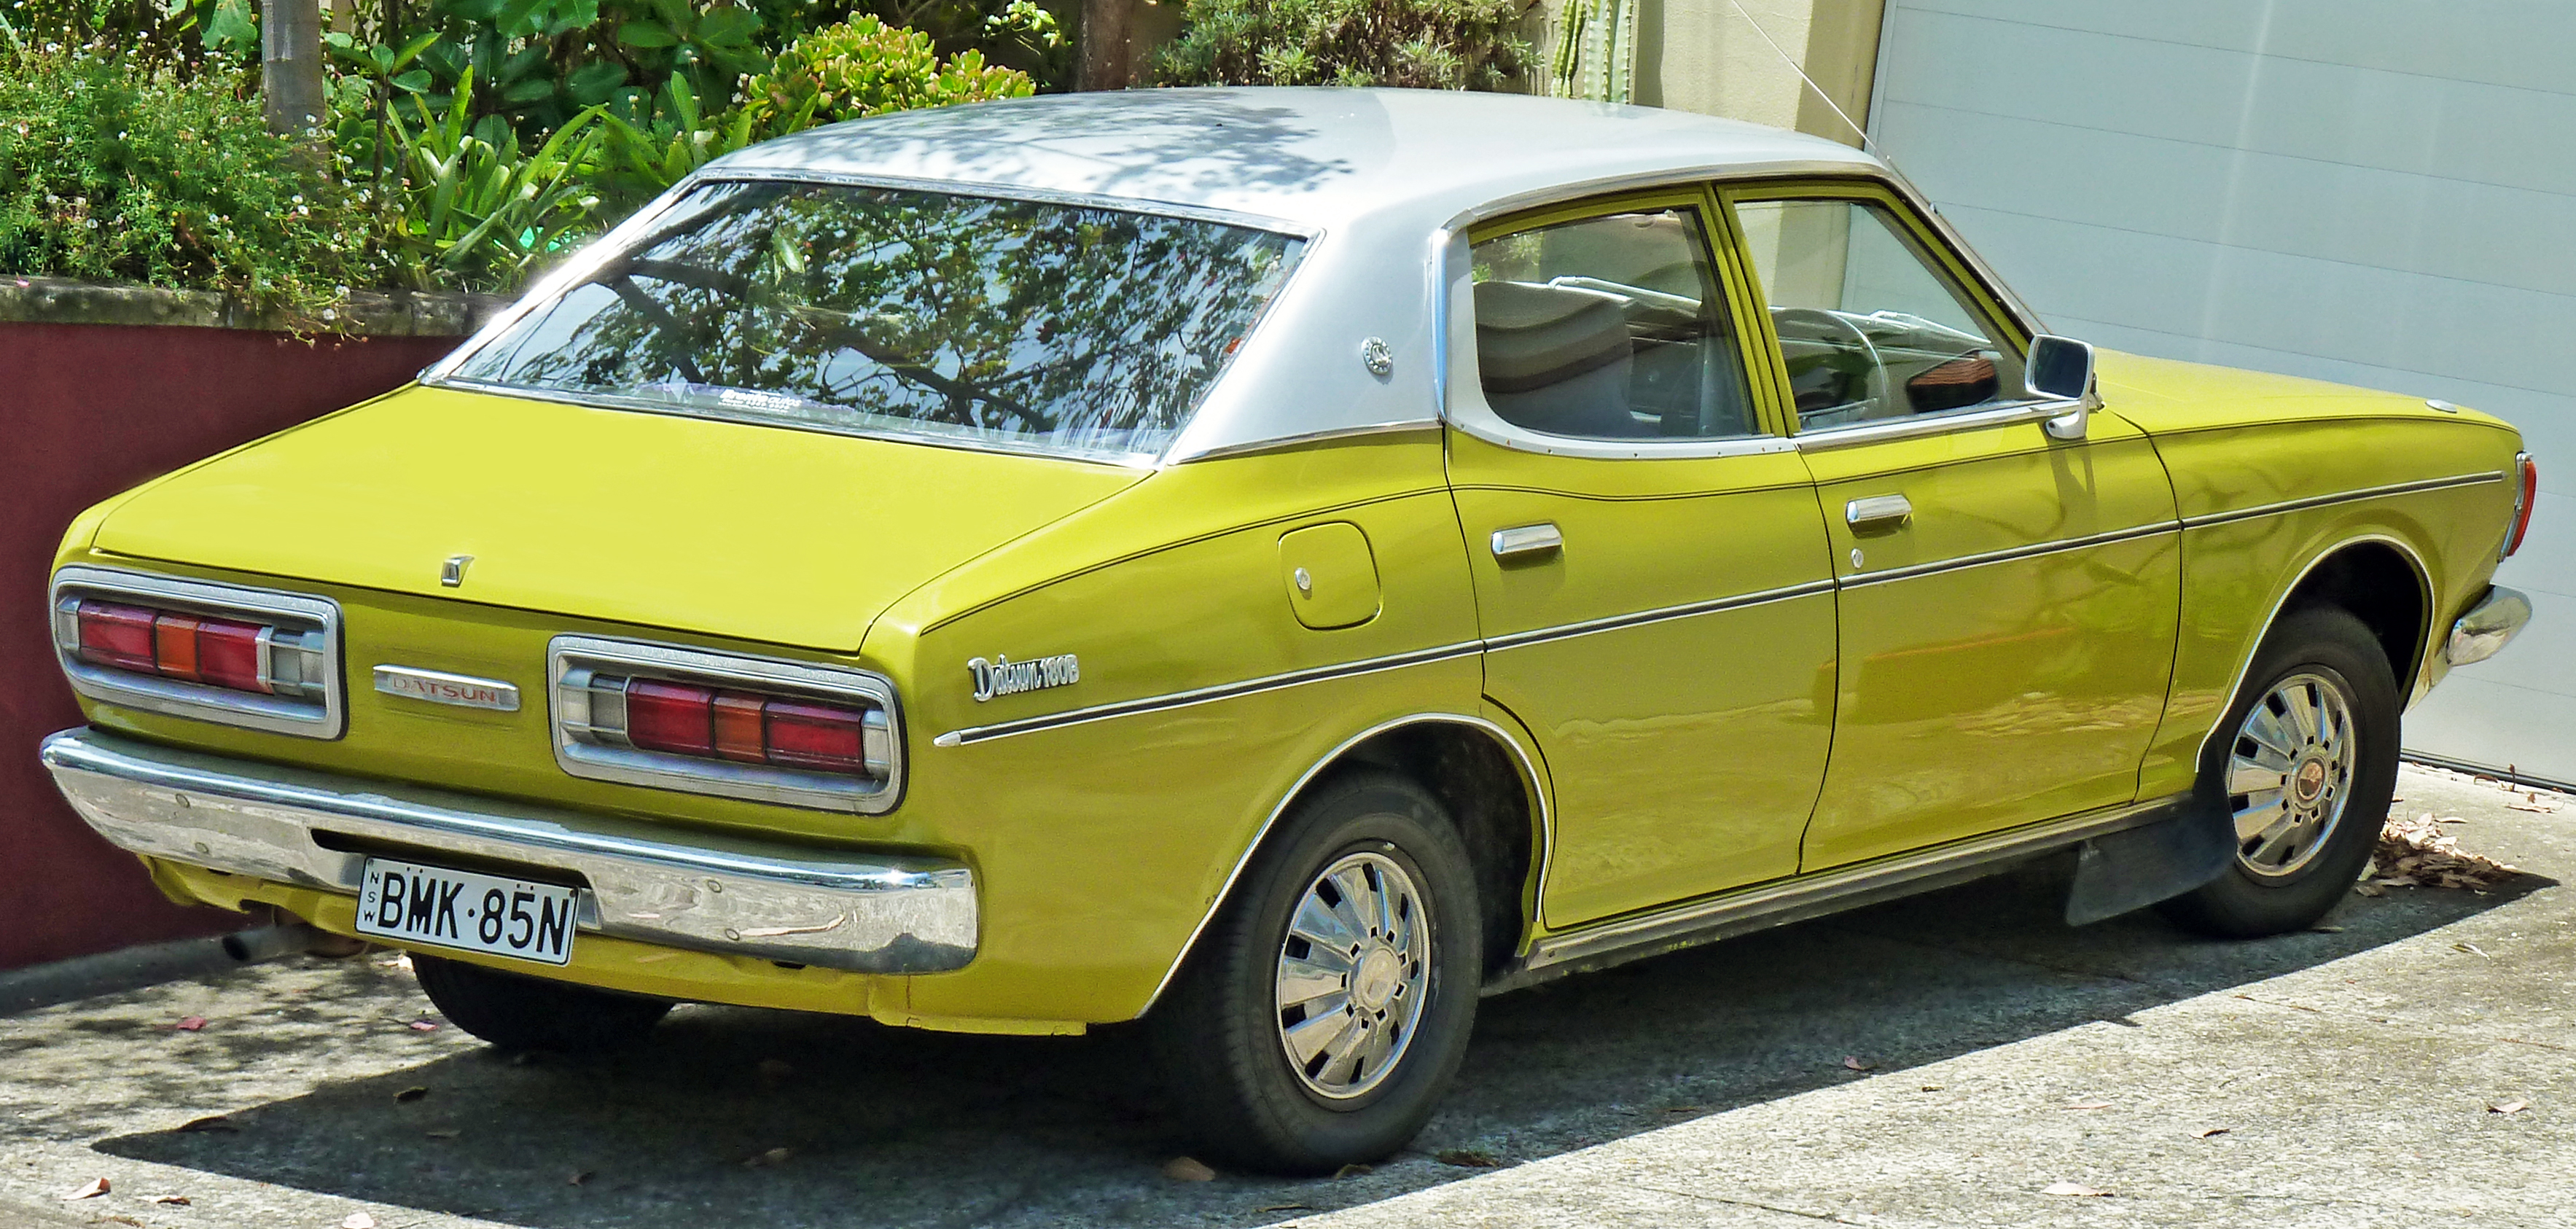 Nissan Bluebird IV (610) 1971 - 1976 Sedan #3